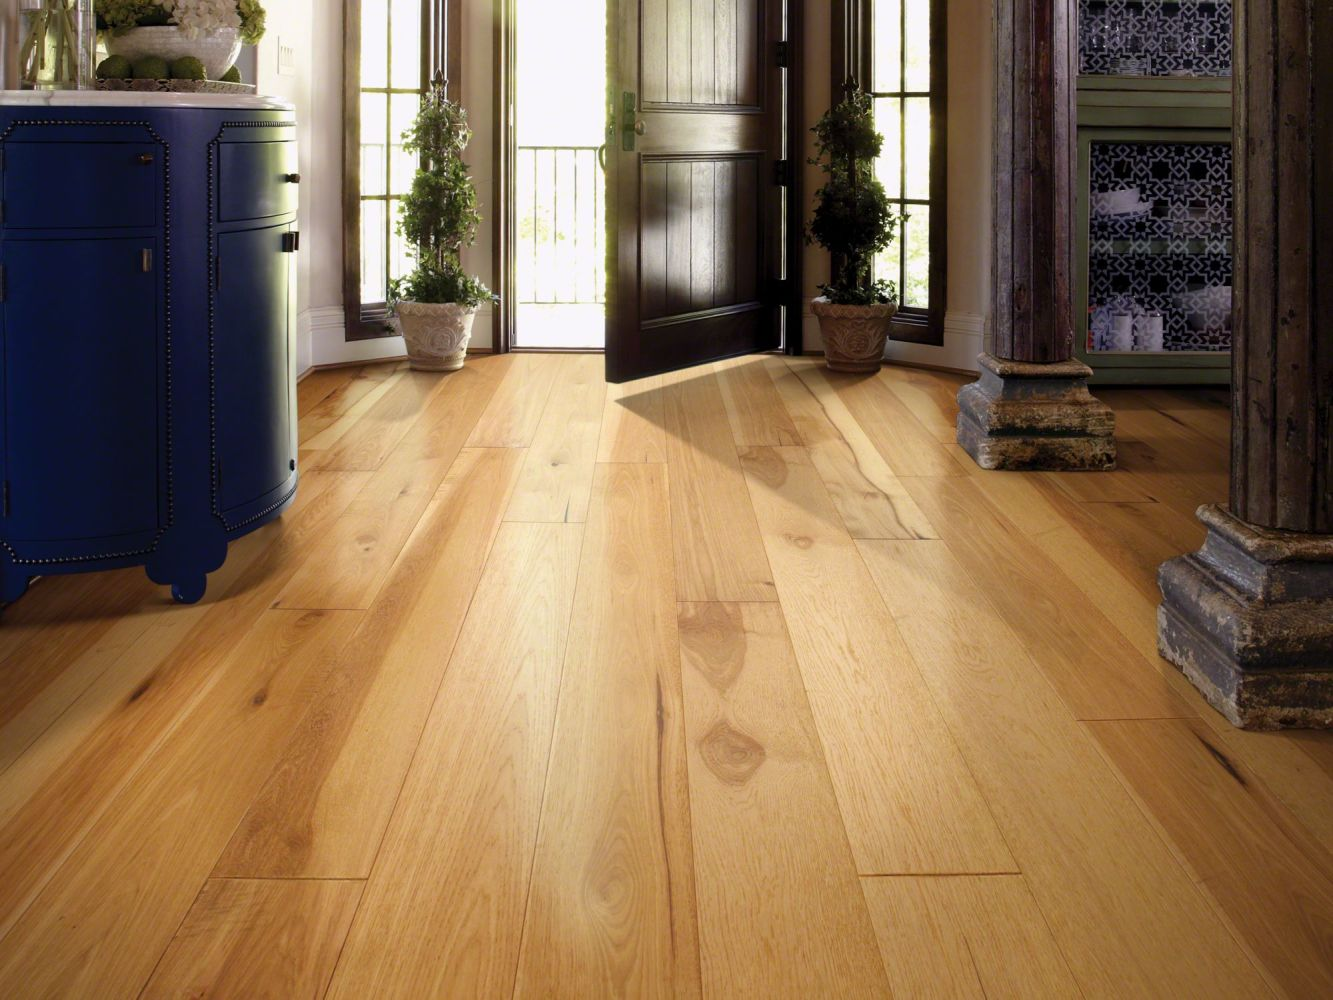 Shaw Floors Home Fn Gold Hardwood Kingston Hickory Coat Of Arms 00993_HW486